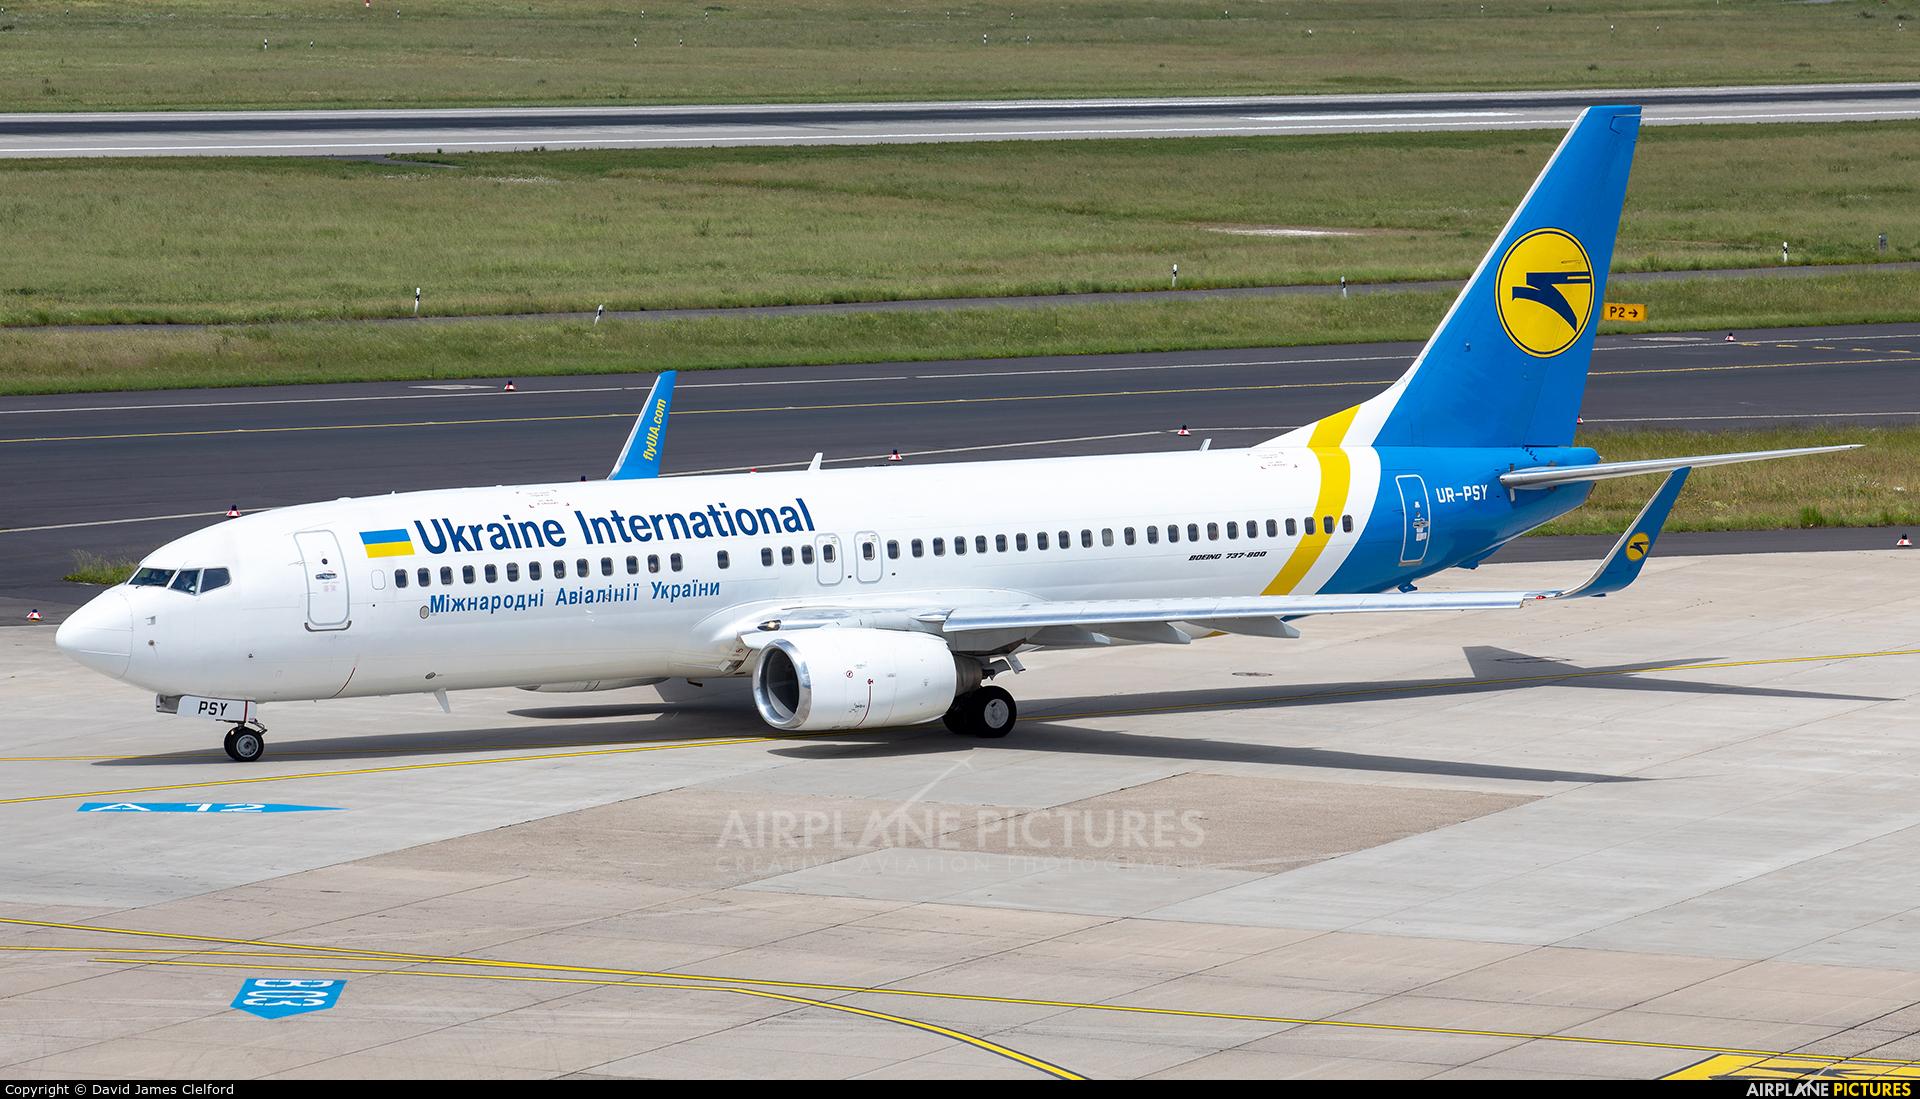 Ukraine International Airlines UR-PSY aircraft at Düsseldorf